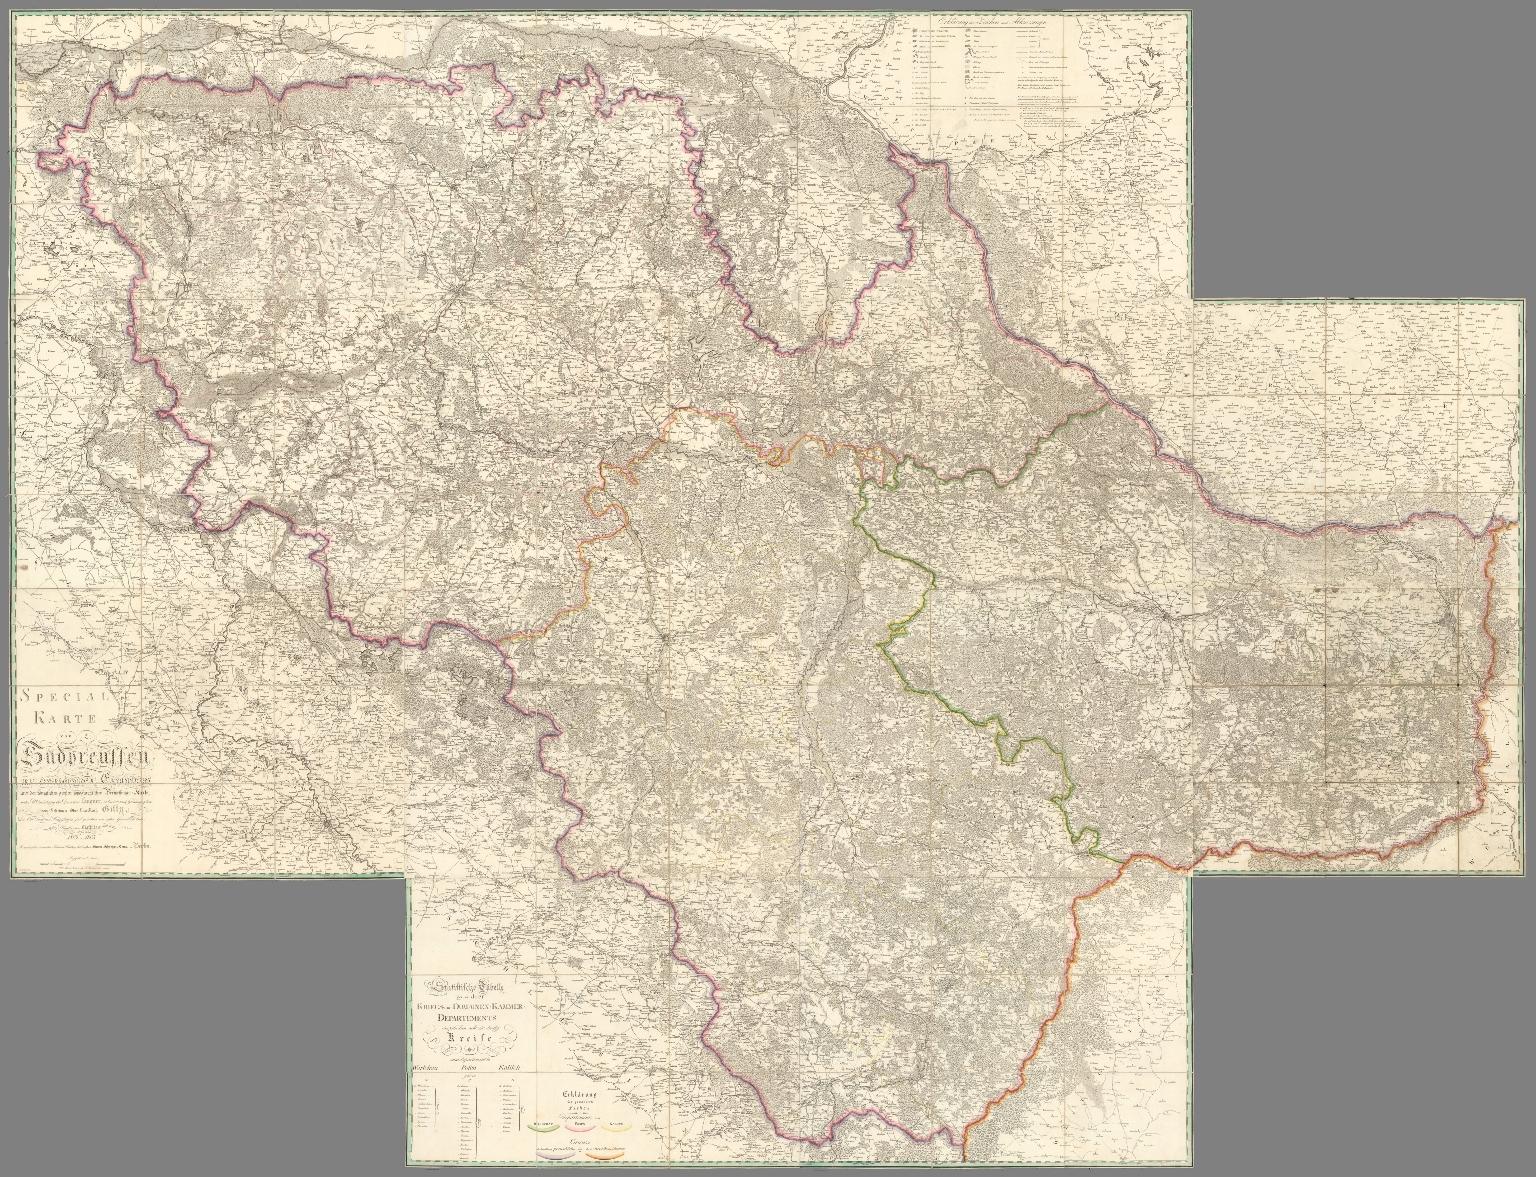 Composite map: Special Karte von Suedpreussen